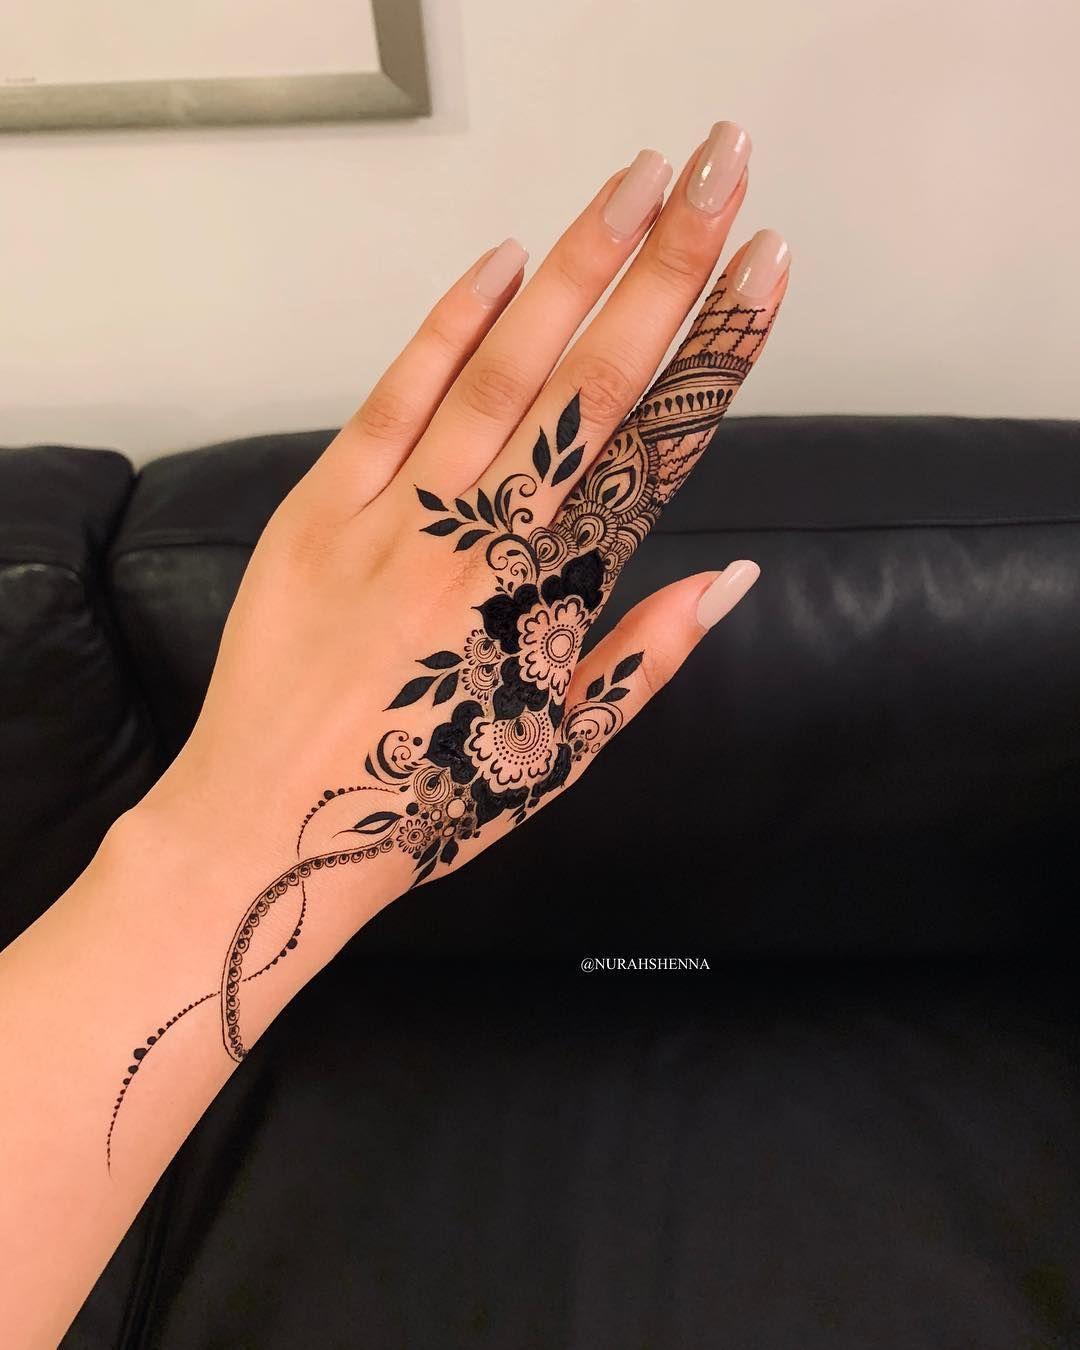 Sama In 2020 Henna Tattoo Designs Hand Henna Tattoo Designs Henna Tattoo Hand